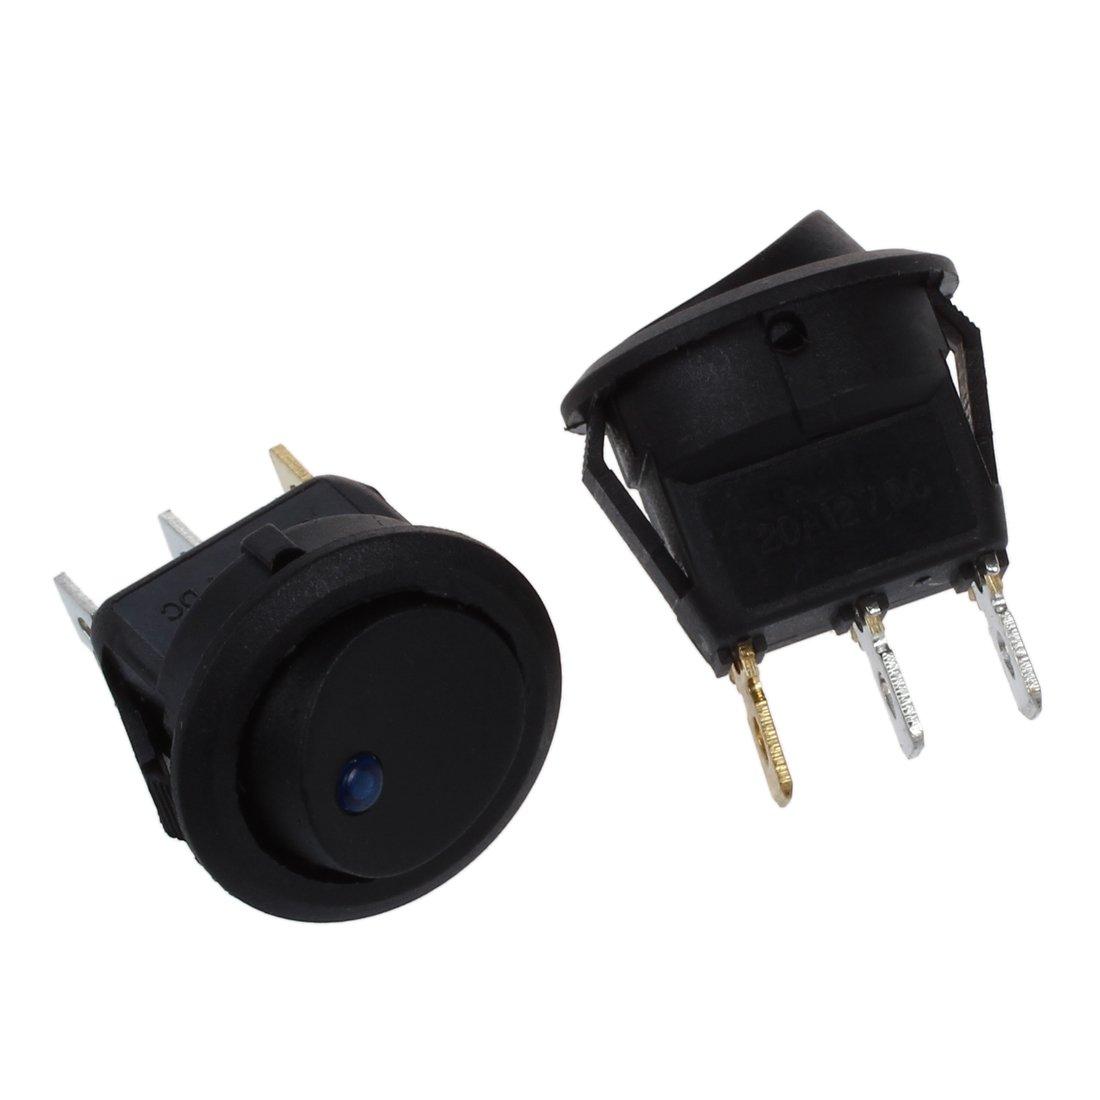 R SODIAL 4 Mini Round LED Rocker Indicator Switch 3 Pin On-Off 12V DC